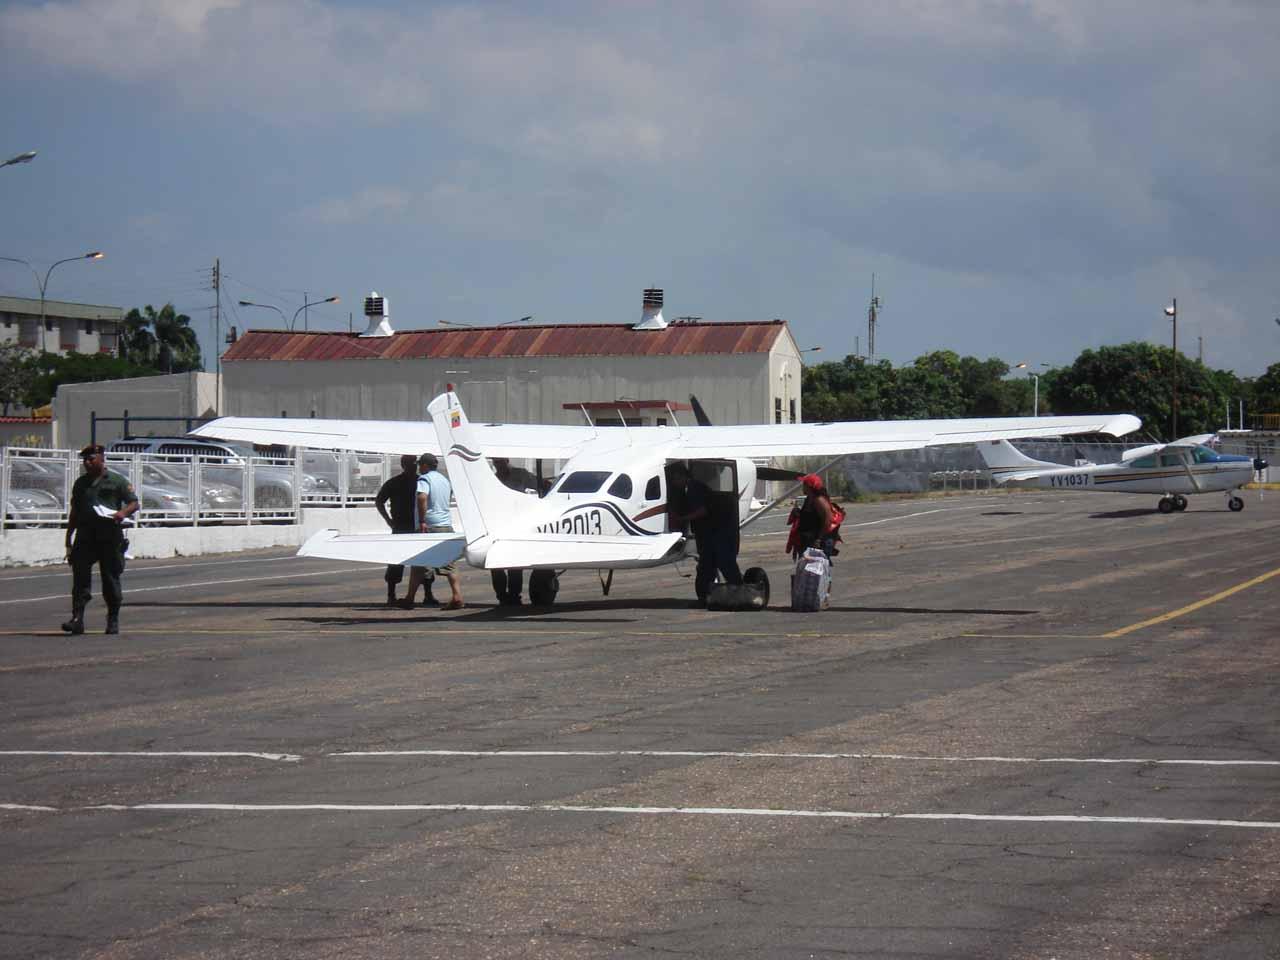 The tiny Cessna plane